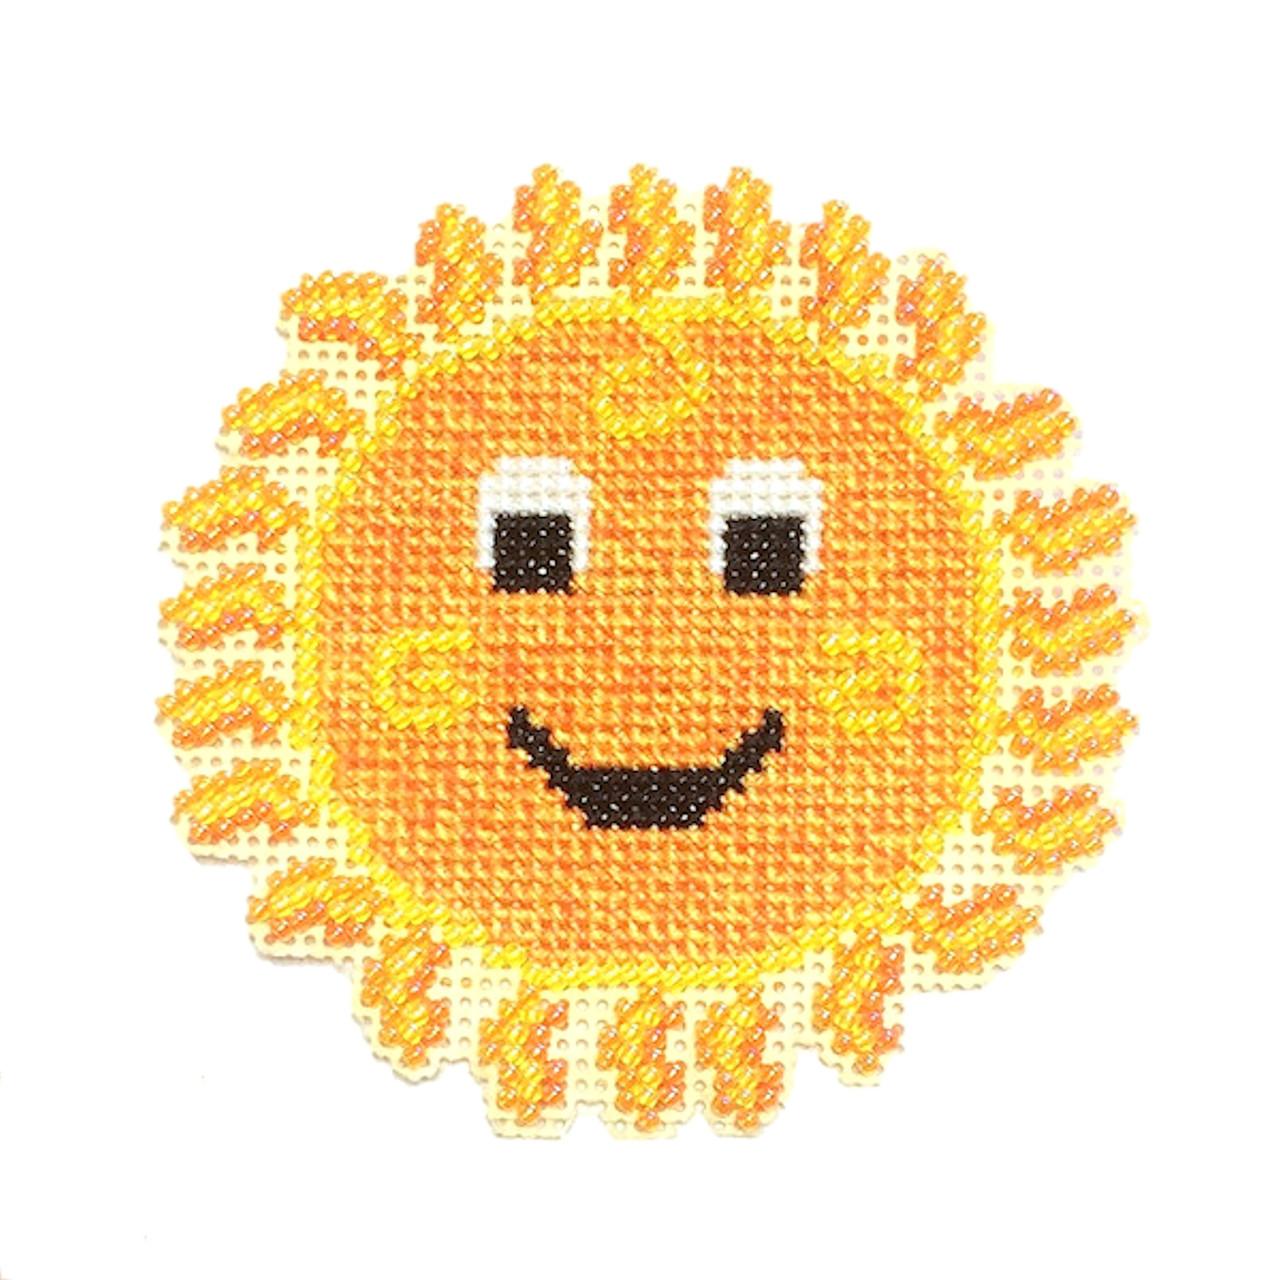 Flowers 2 Flowers - Sunny Buddy